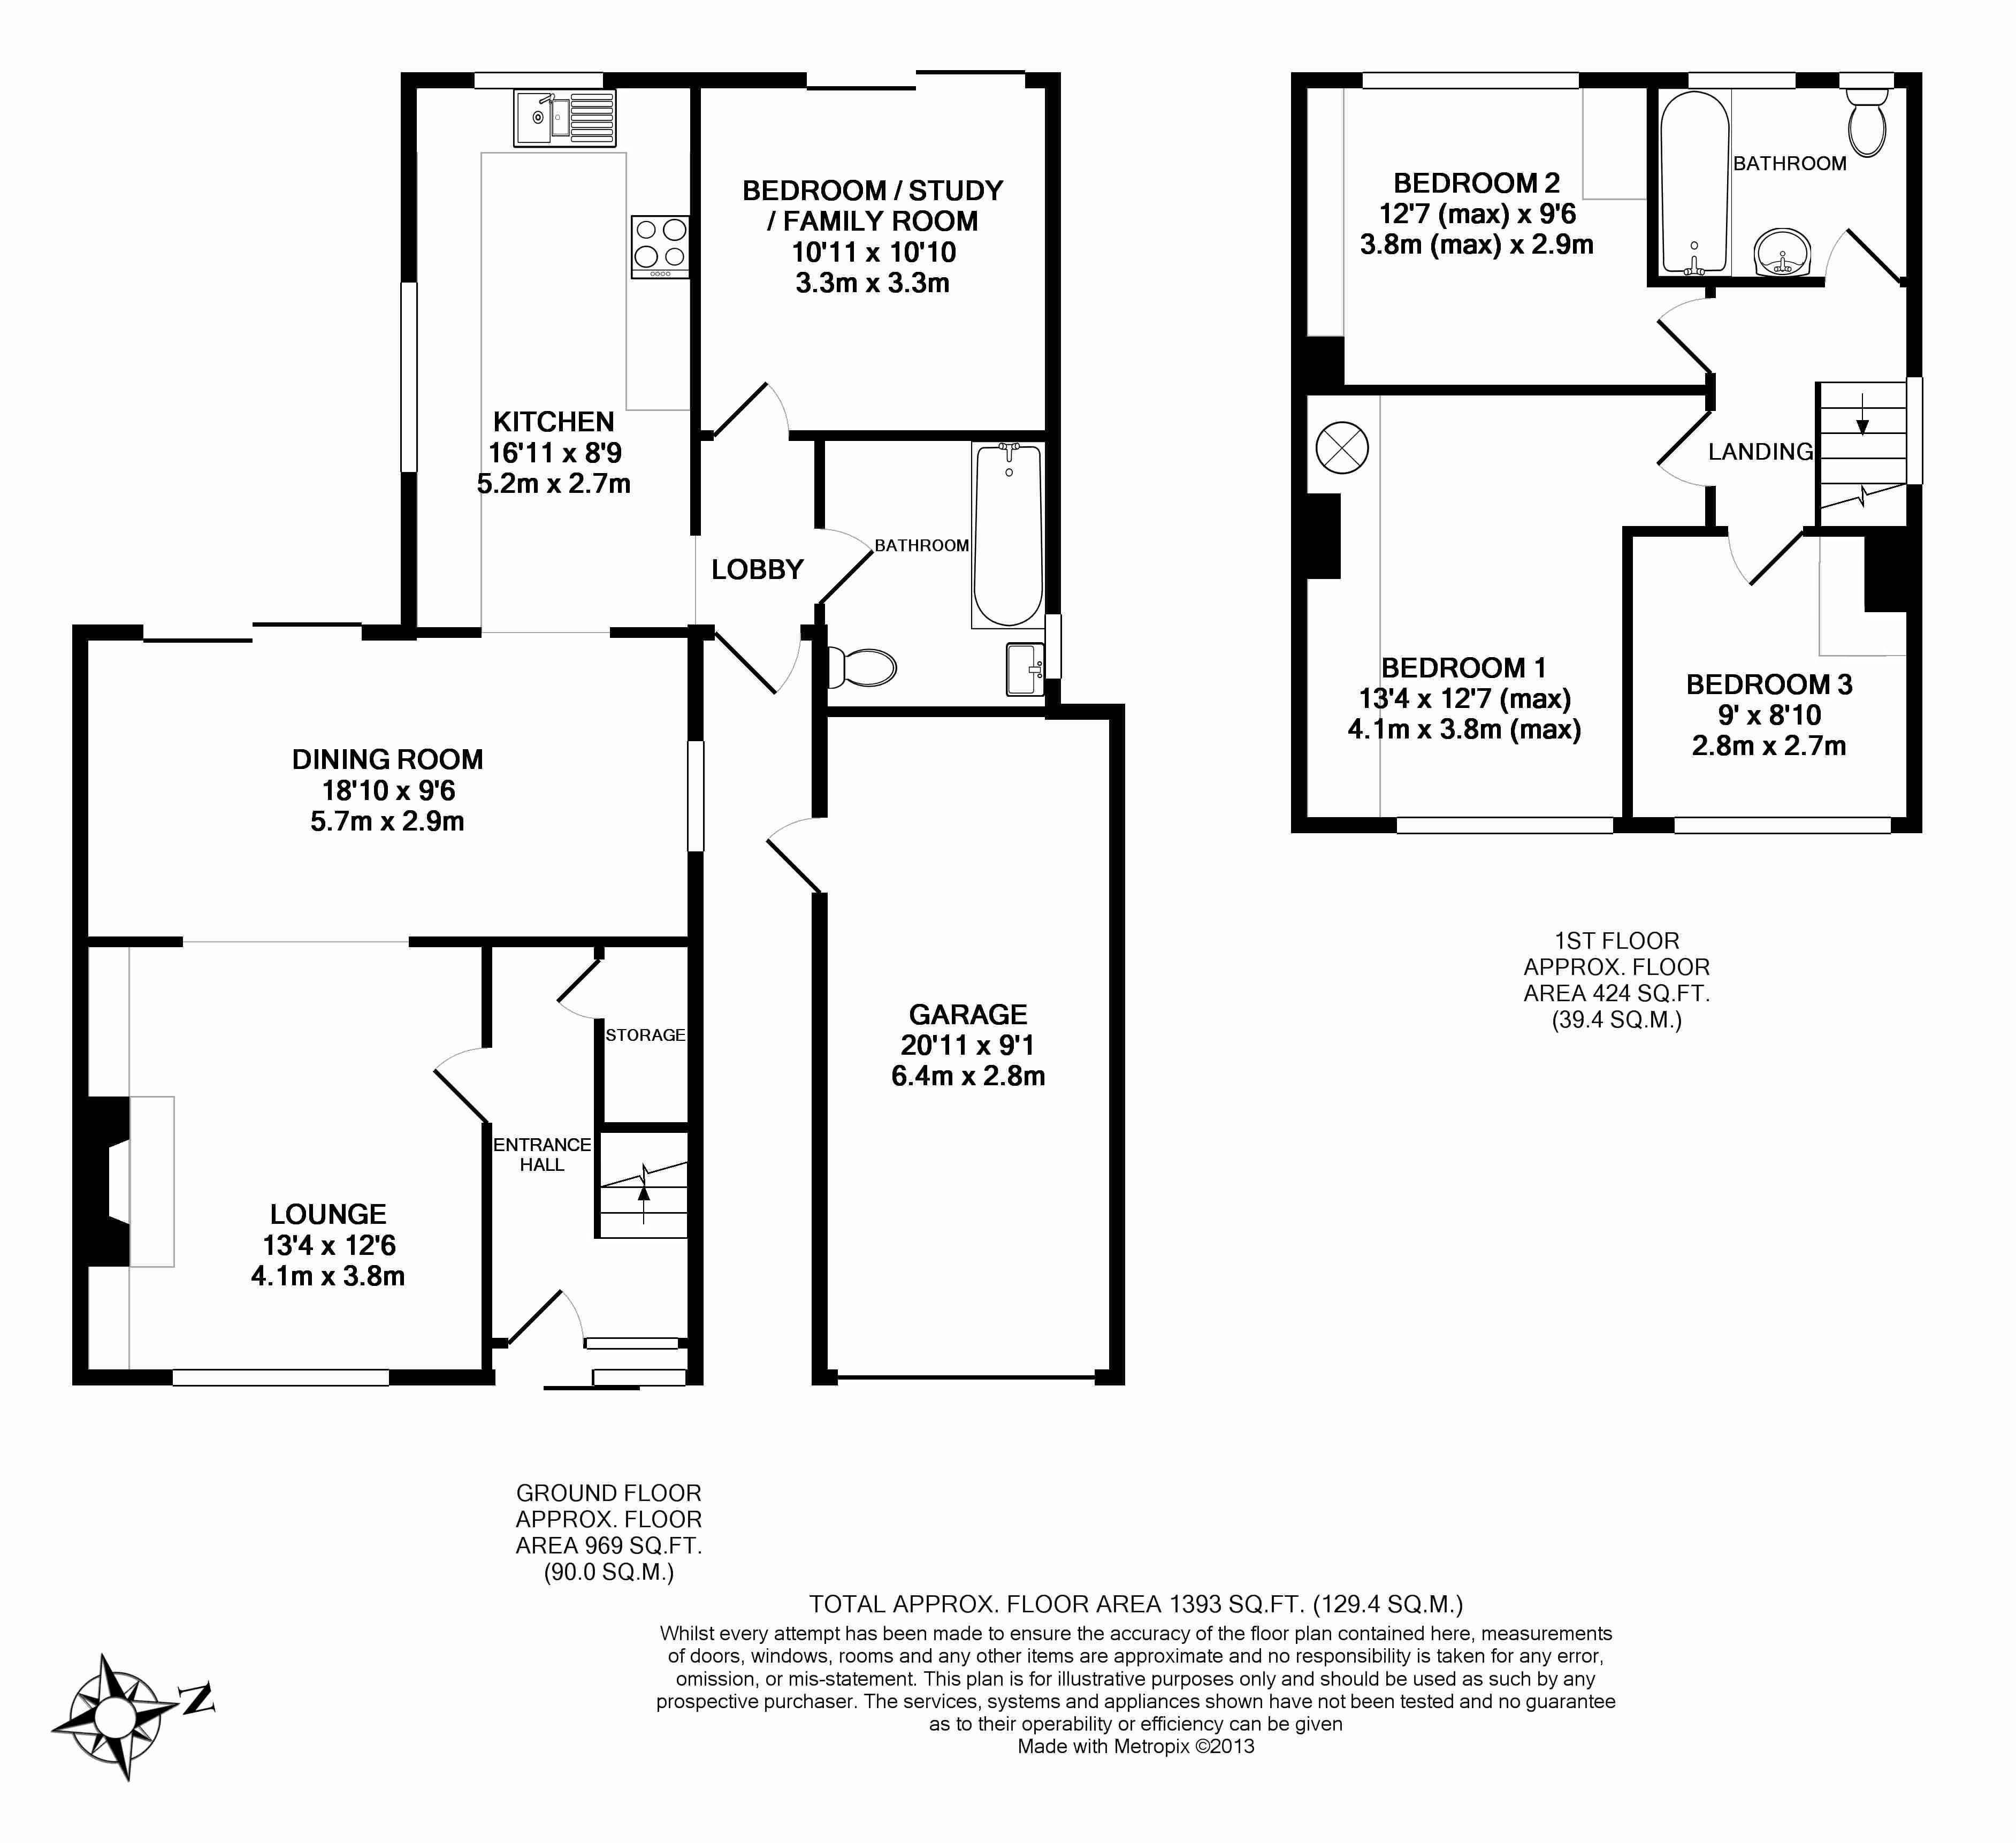 Semi Detached Houses Design: 1930's UK Semi-detached House In 2019